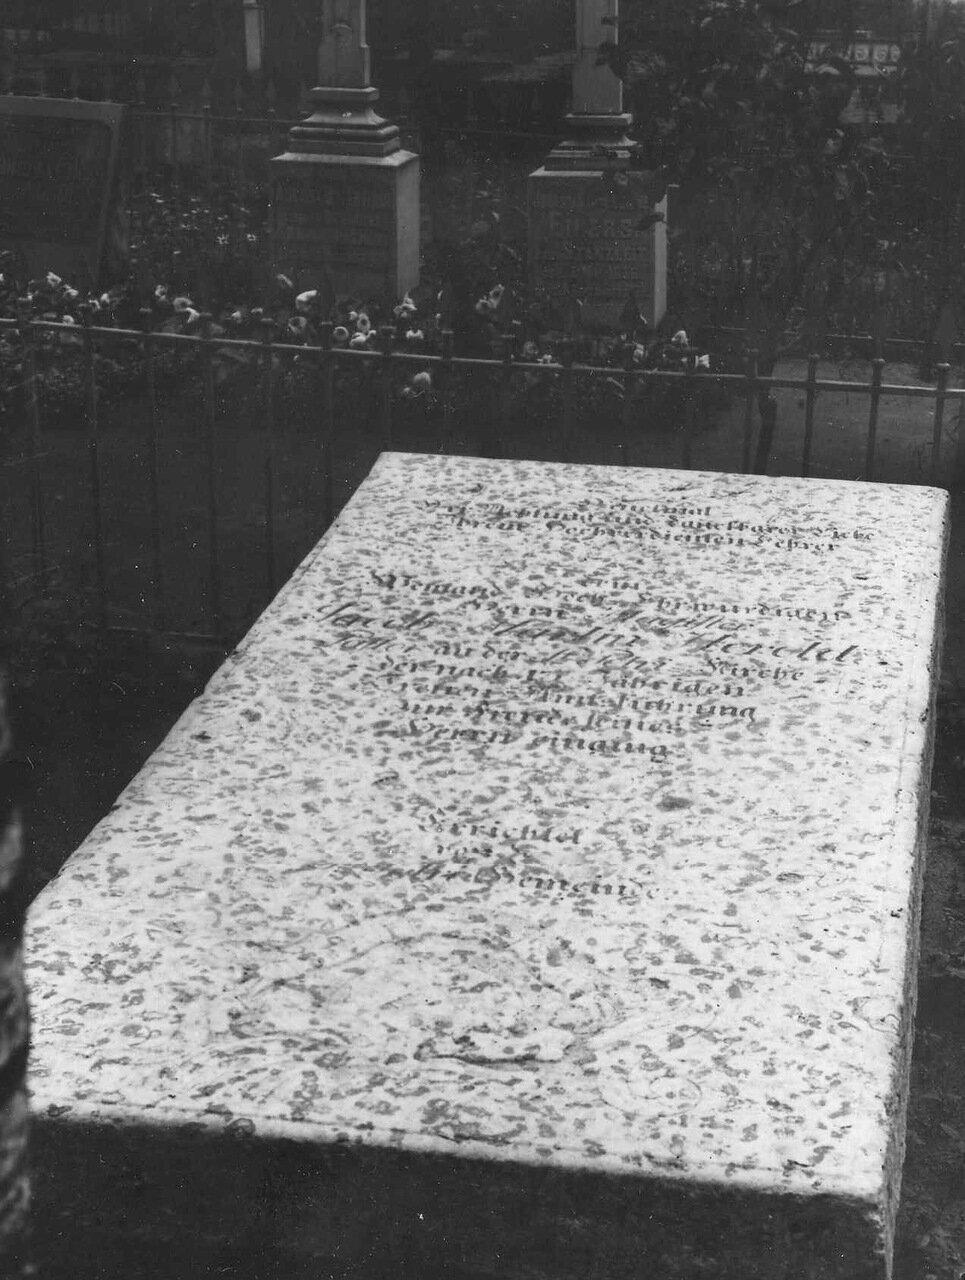 07. Вид надгробной доски